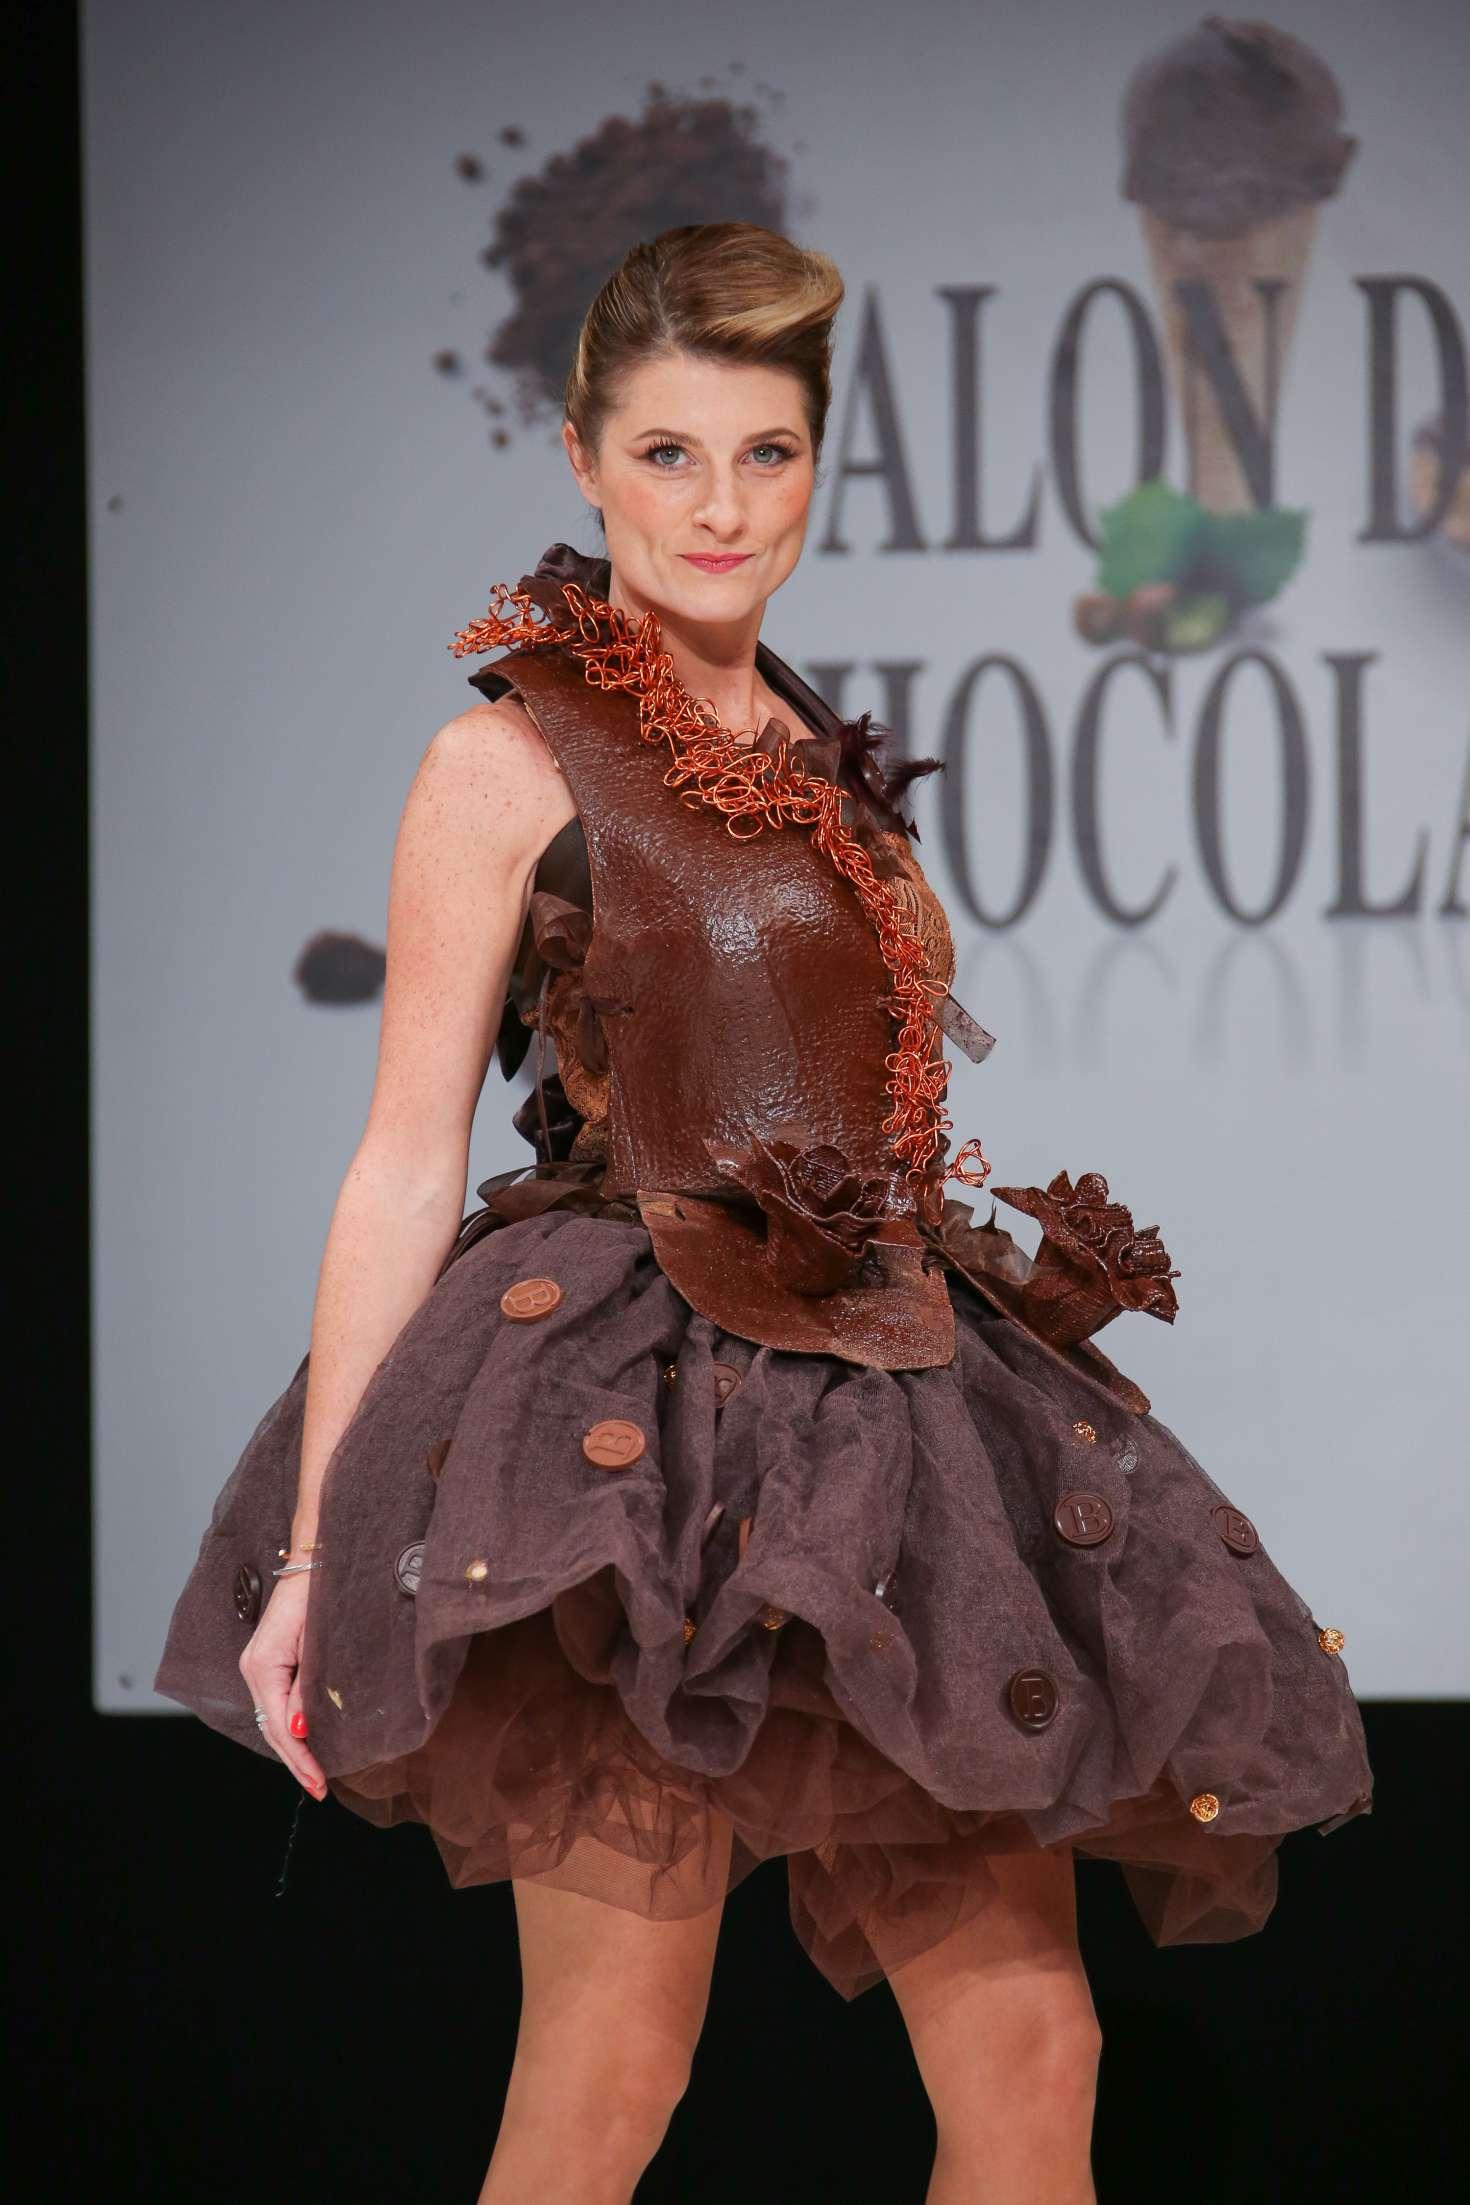 Sandrine arcizet 39 salon du chocolat paris 2017 39 chocolate fair in paris - Salon du chocolat 2017 paris ...